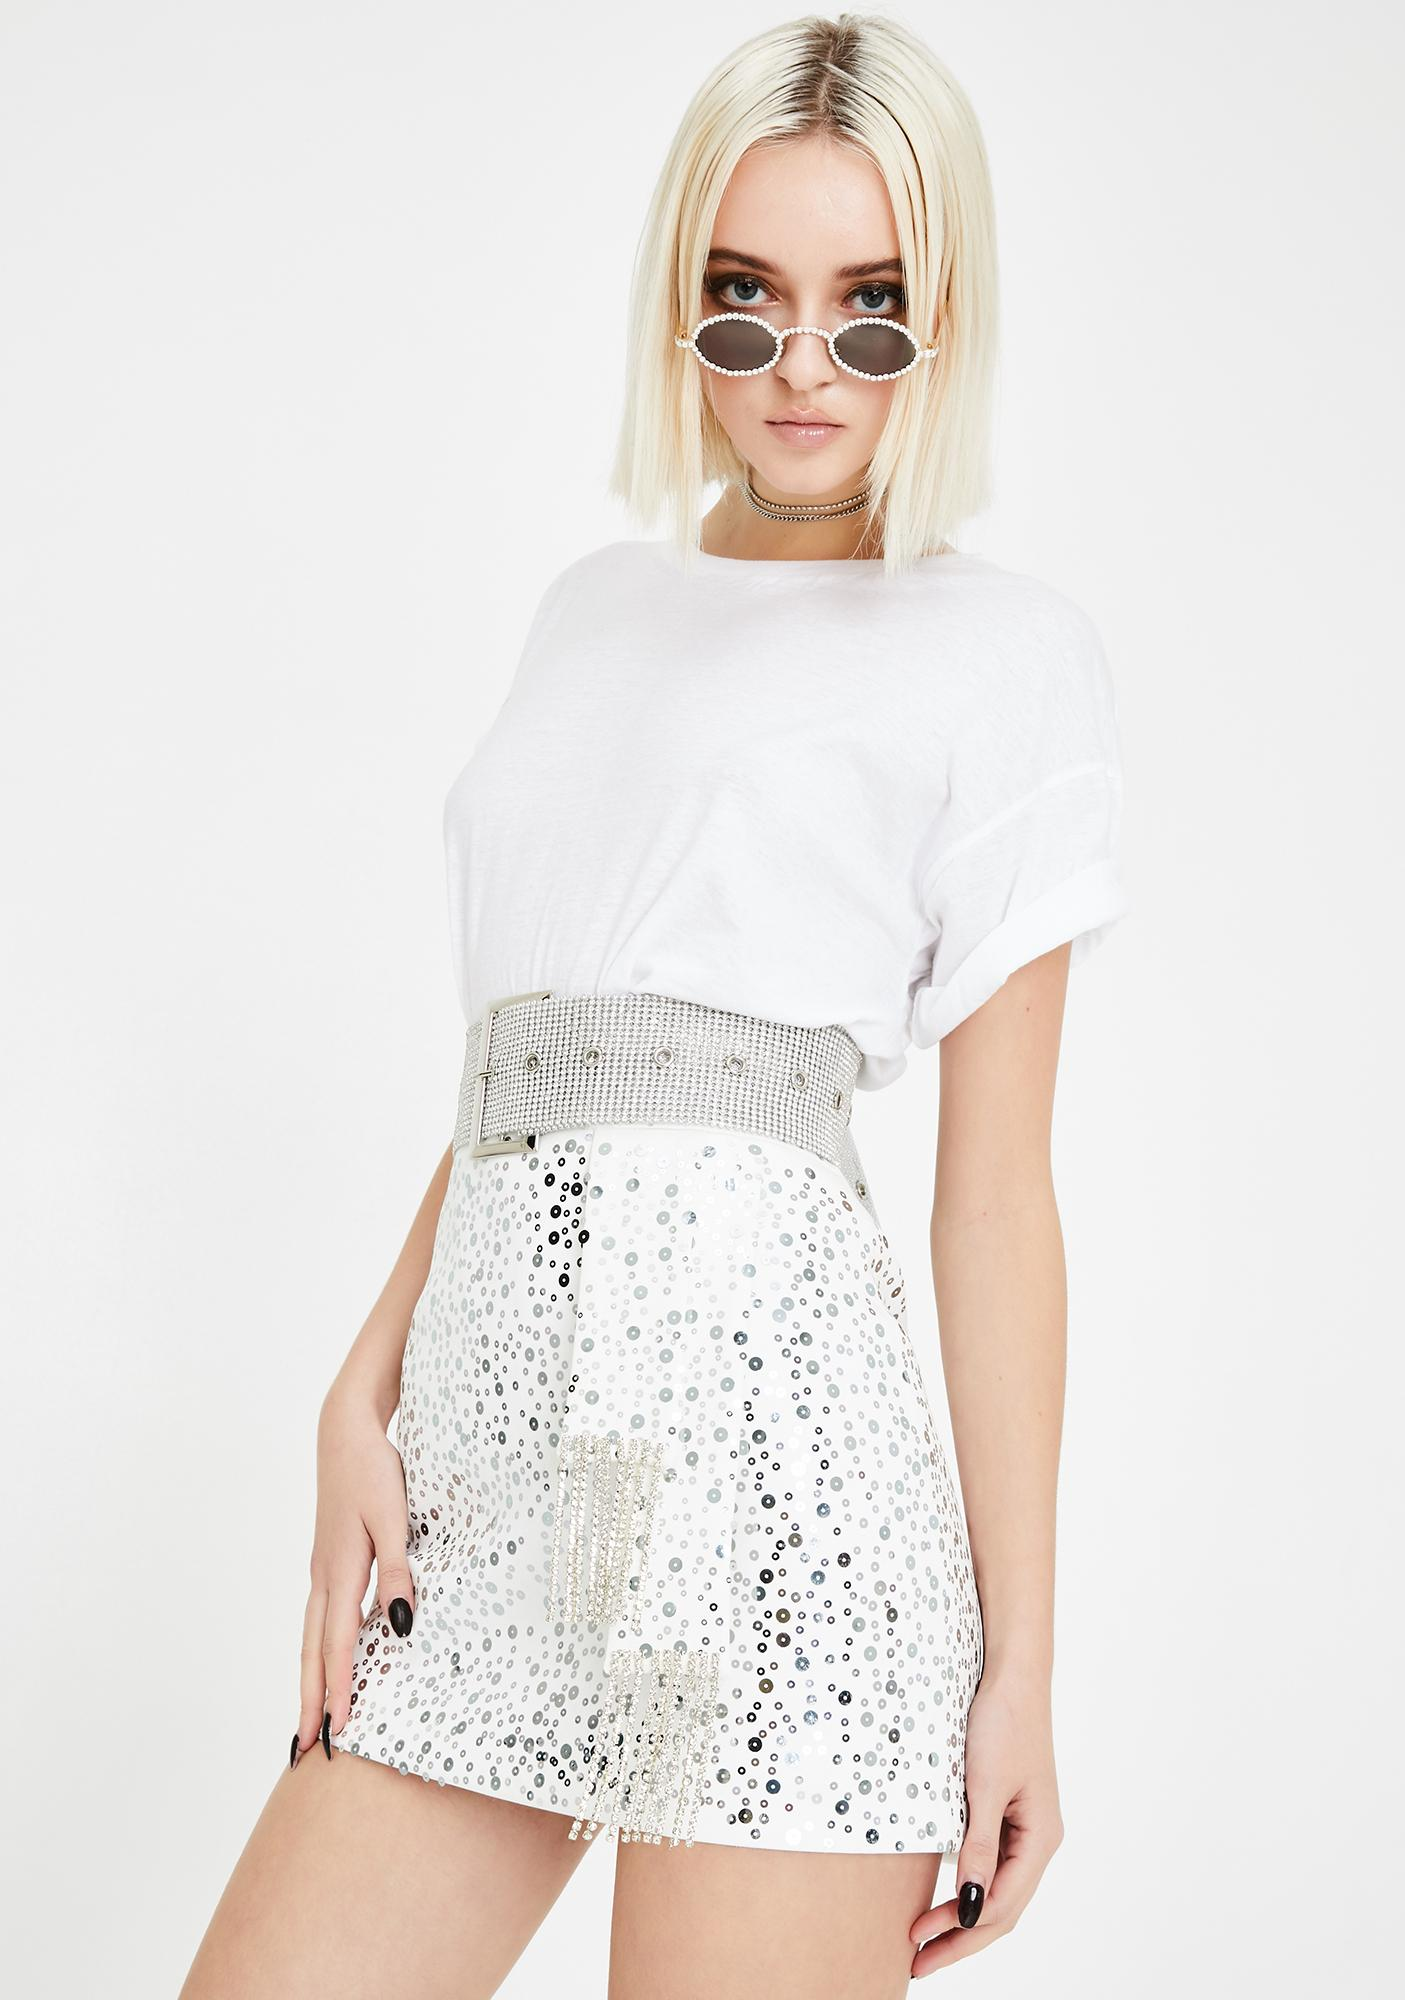 Kiki Riki Disco Chic Mini Skirt